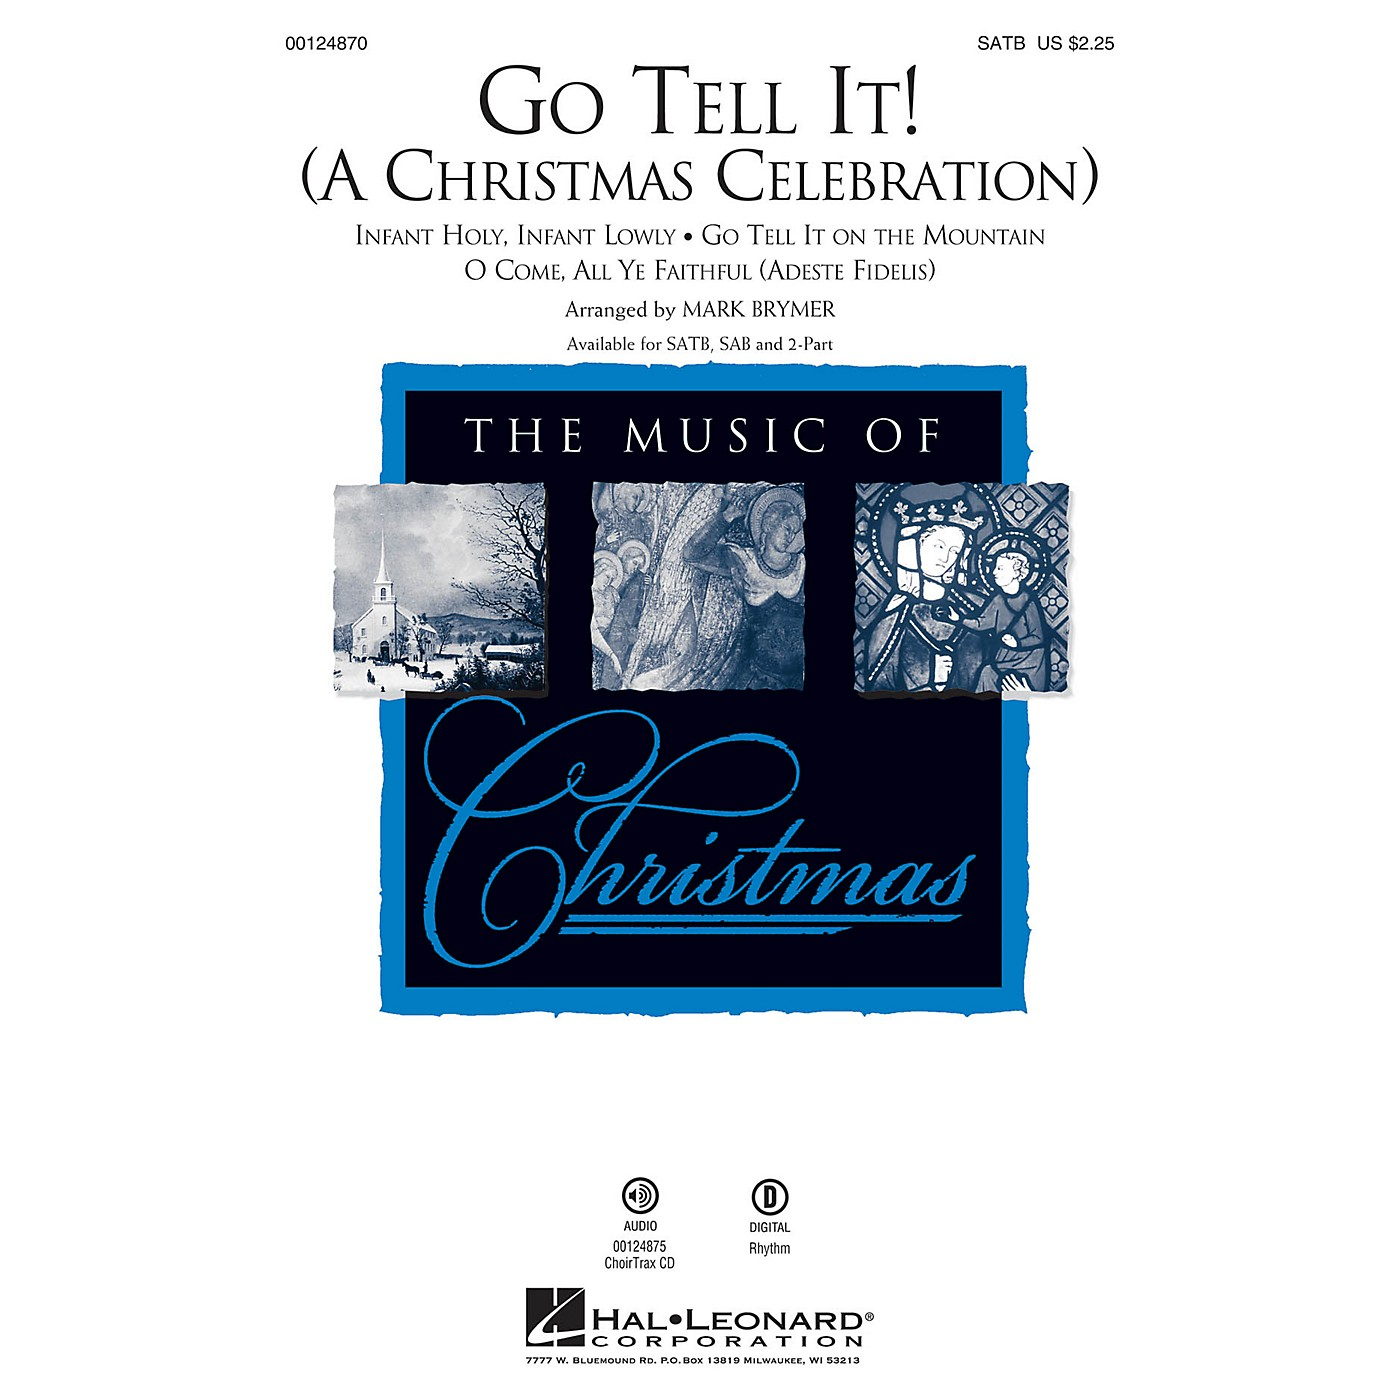 Hal Leonard Go Tell It! (A Christmas Celebration) SAB Arranged by Mark Brymer thumbnail